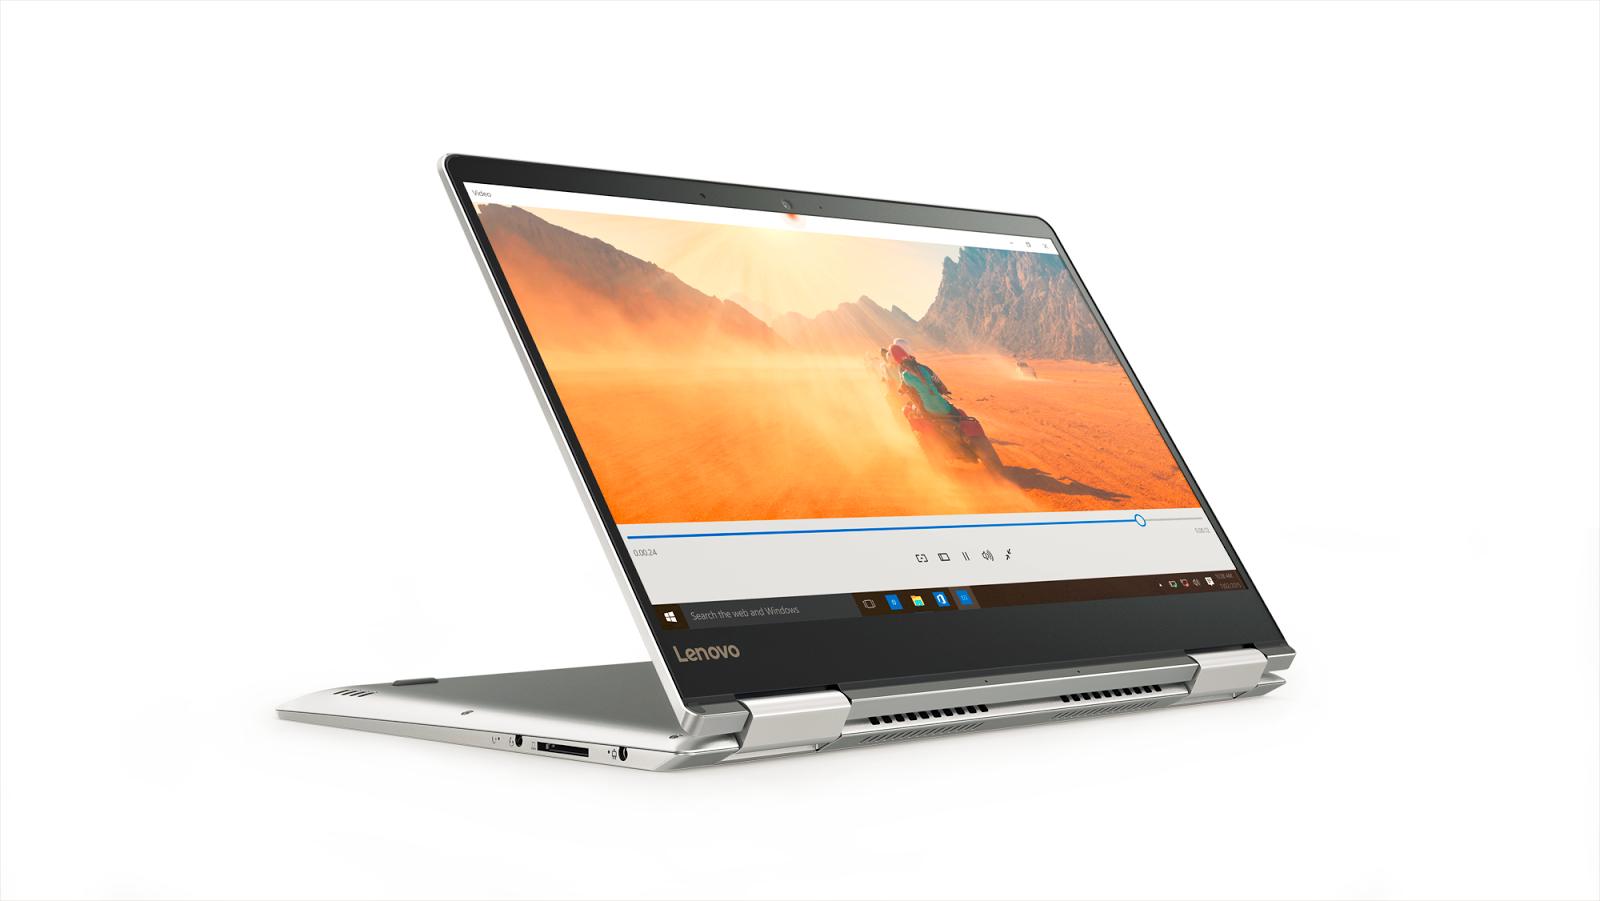 Зачем Lenovo установила Wi-Fi-модуль в шарнир ноутбука? - 5